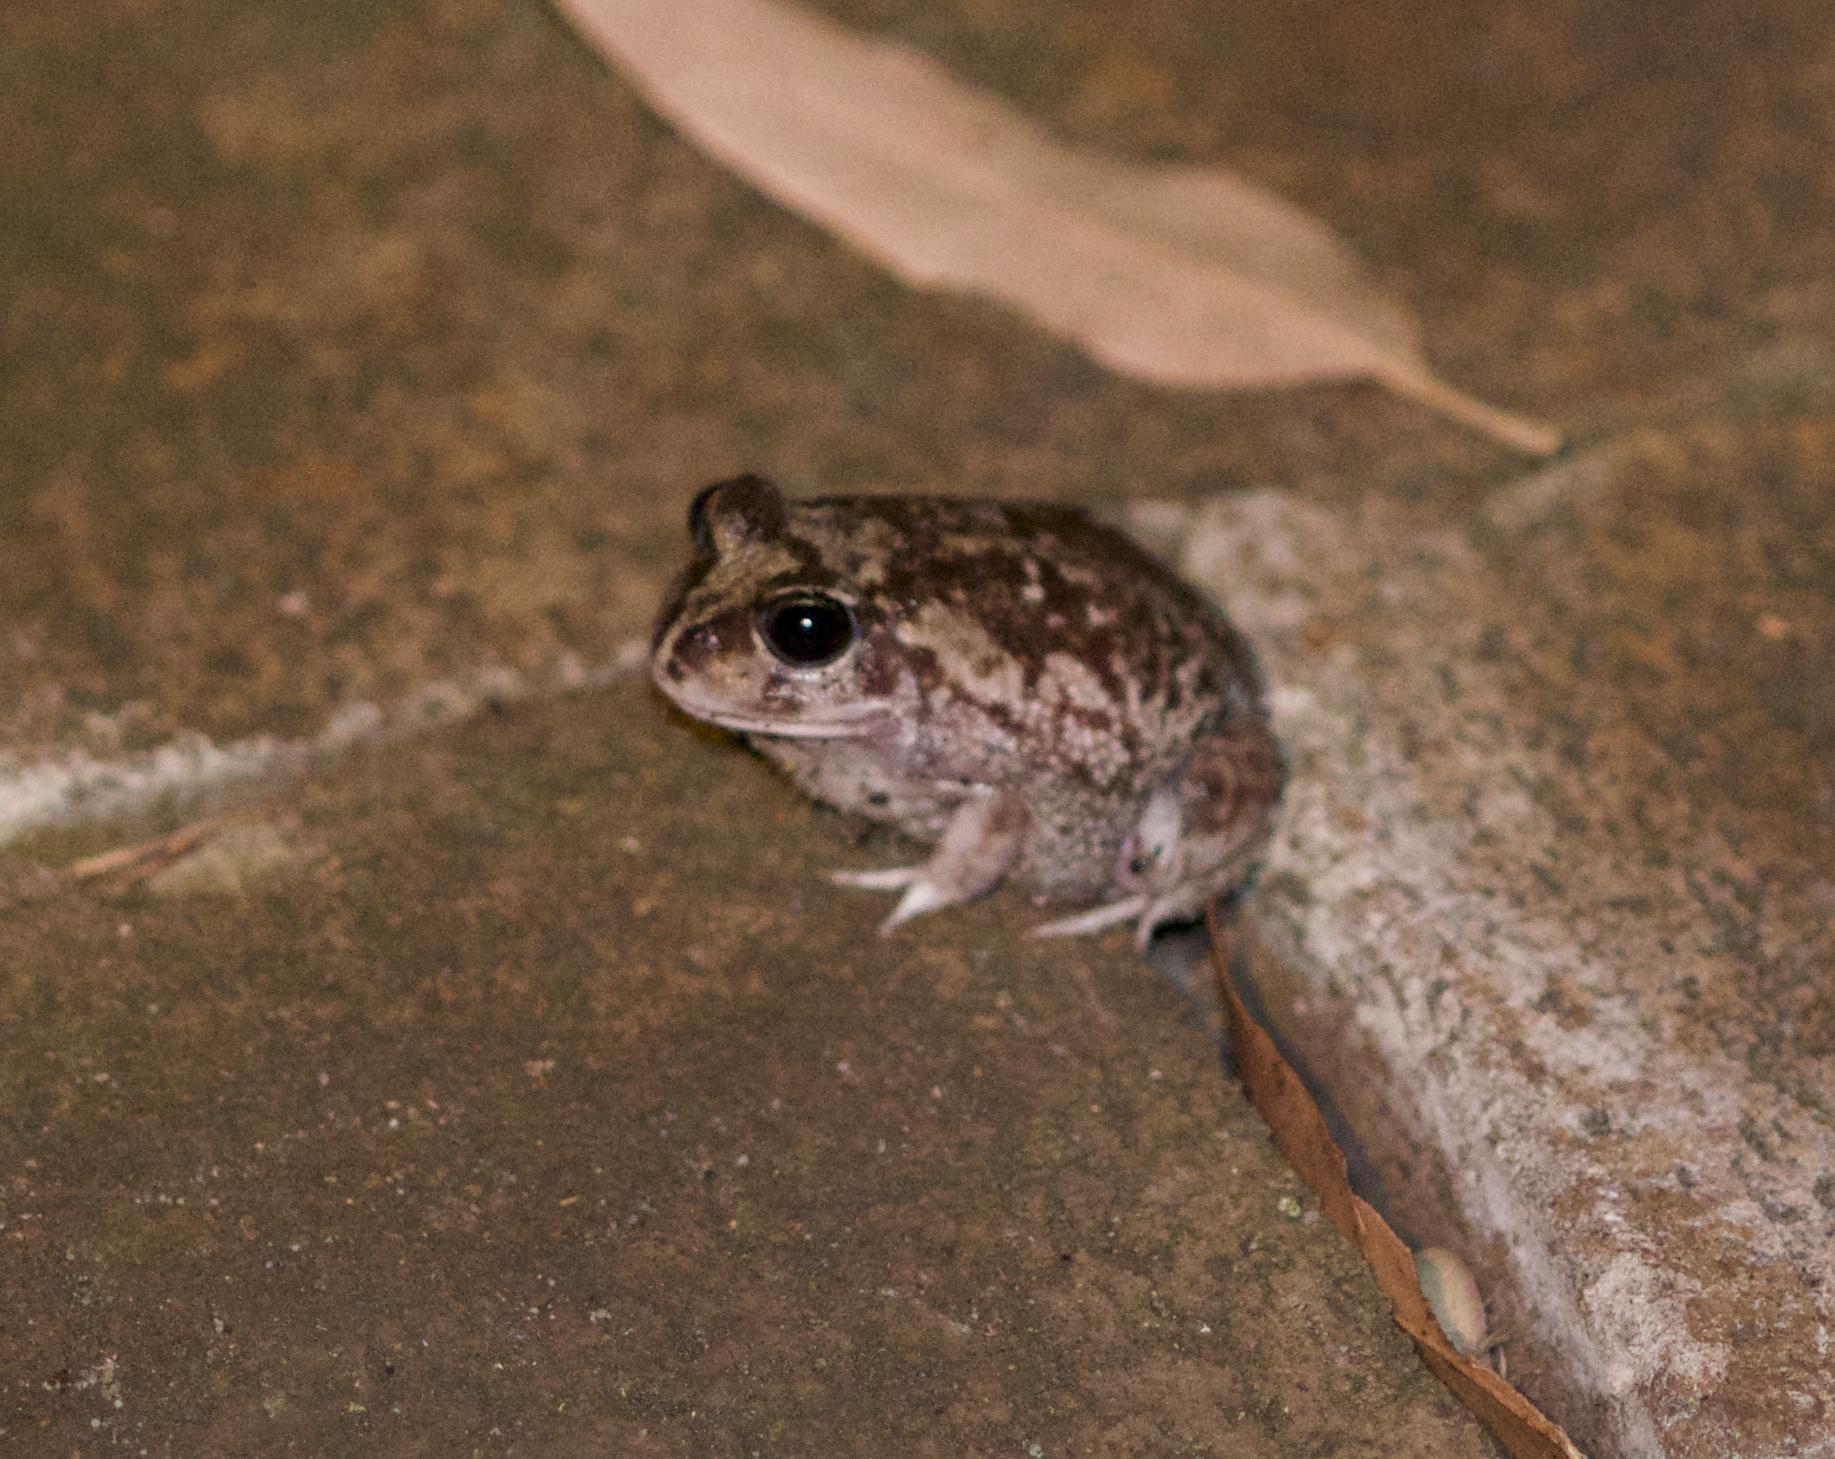 Moaning frog- Helioporus eyrei